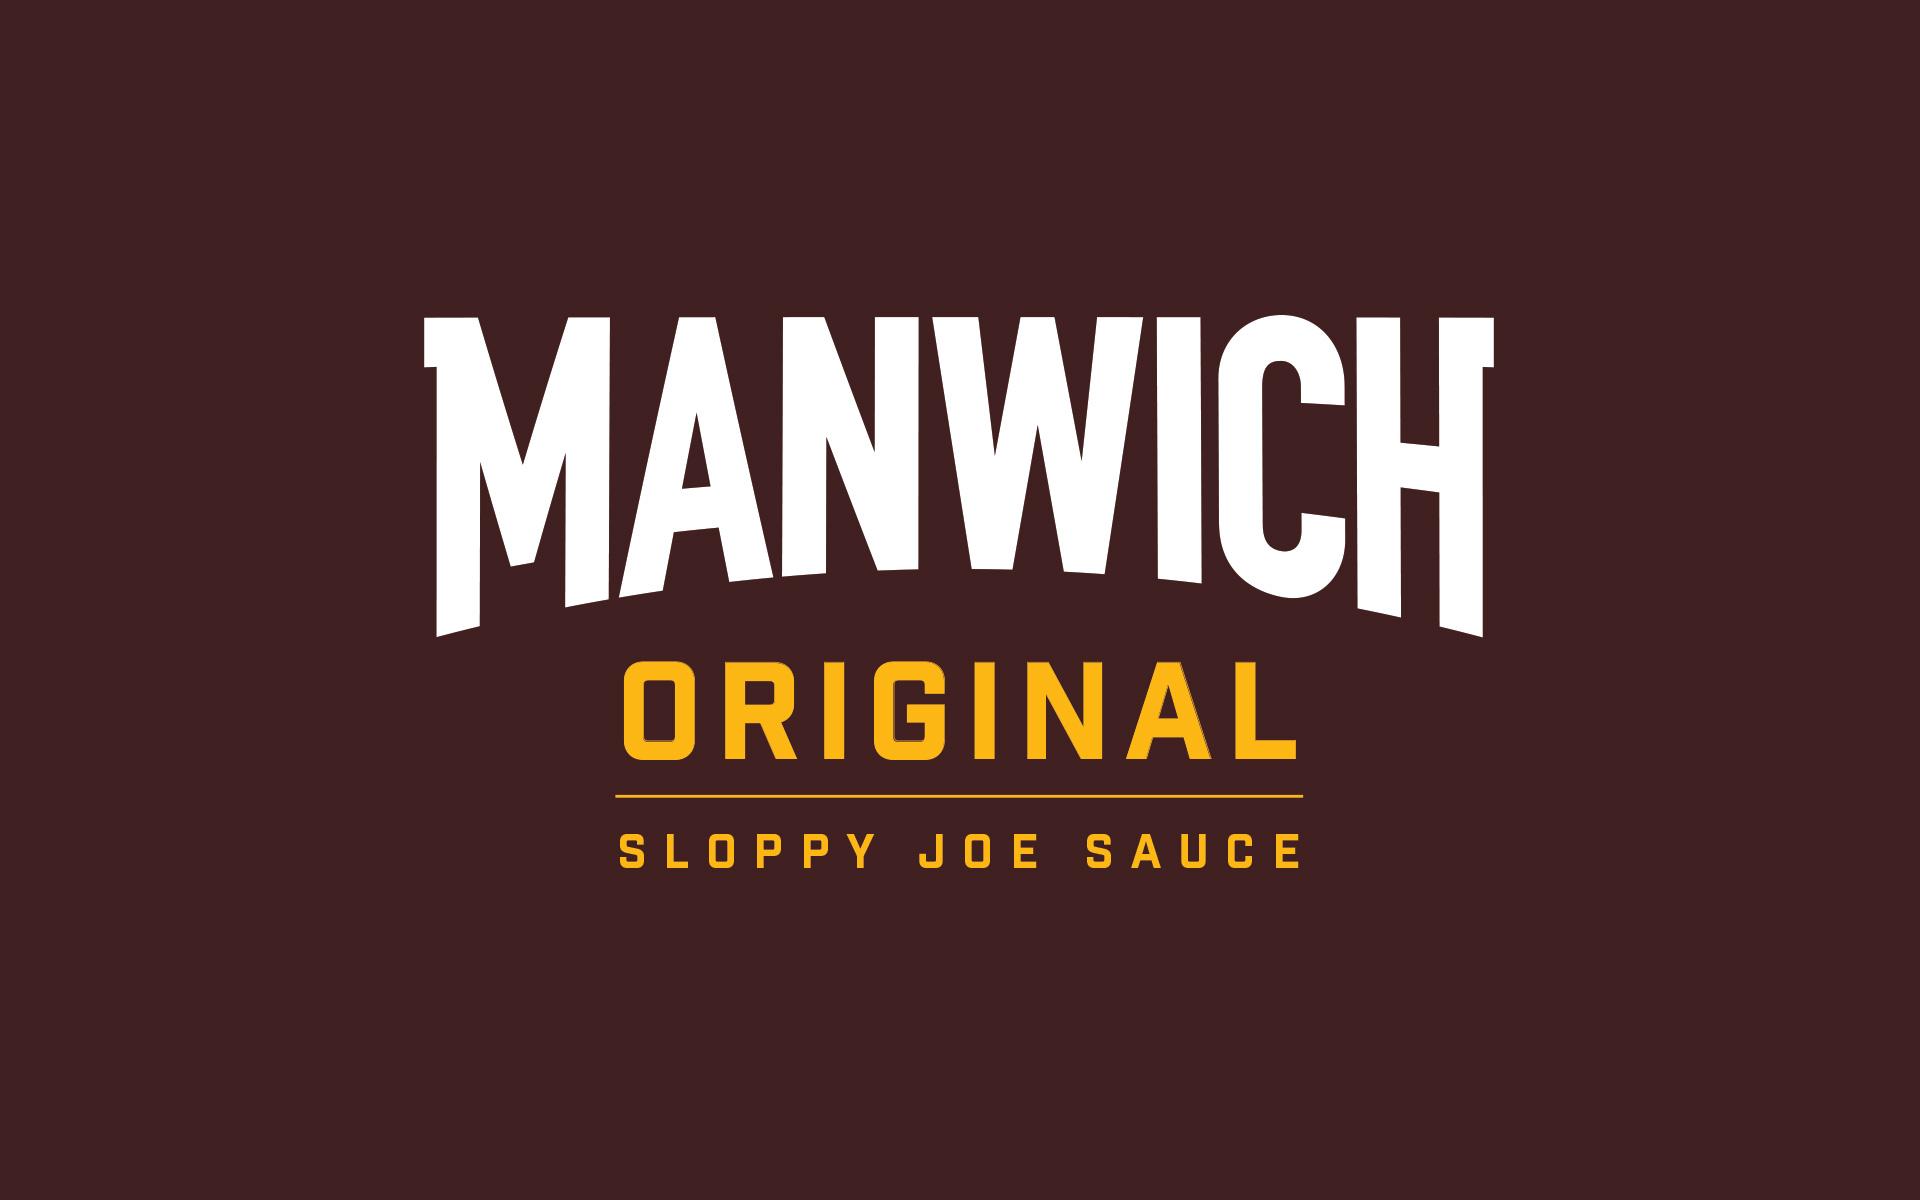 Manwich - Brand Identity